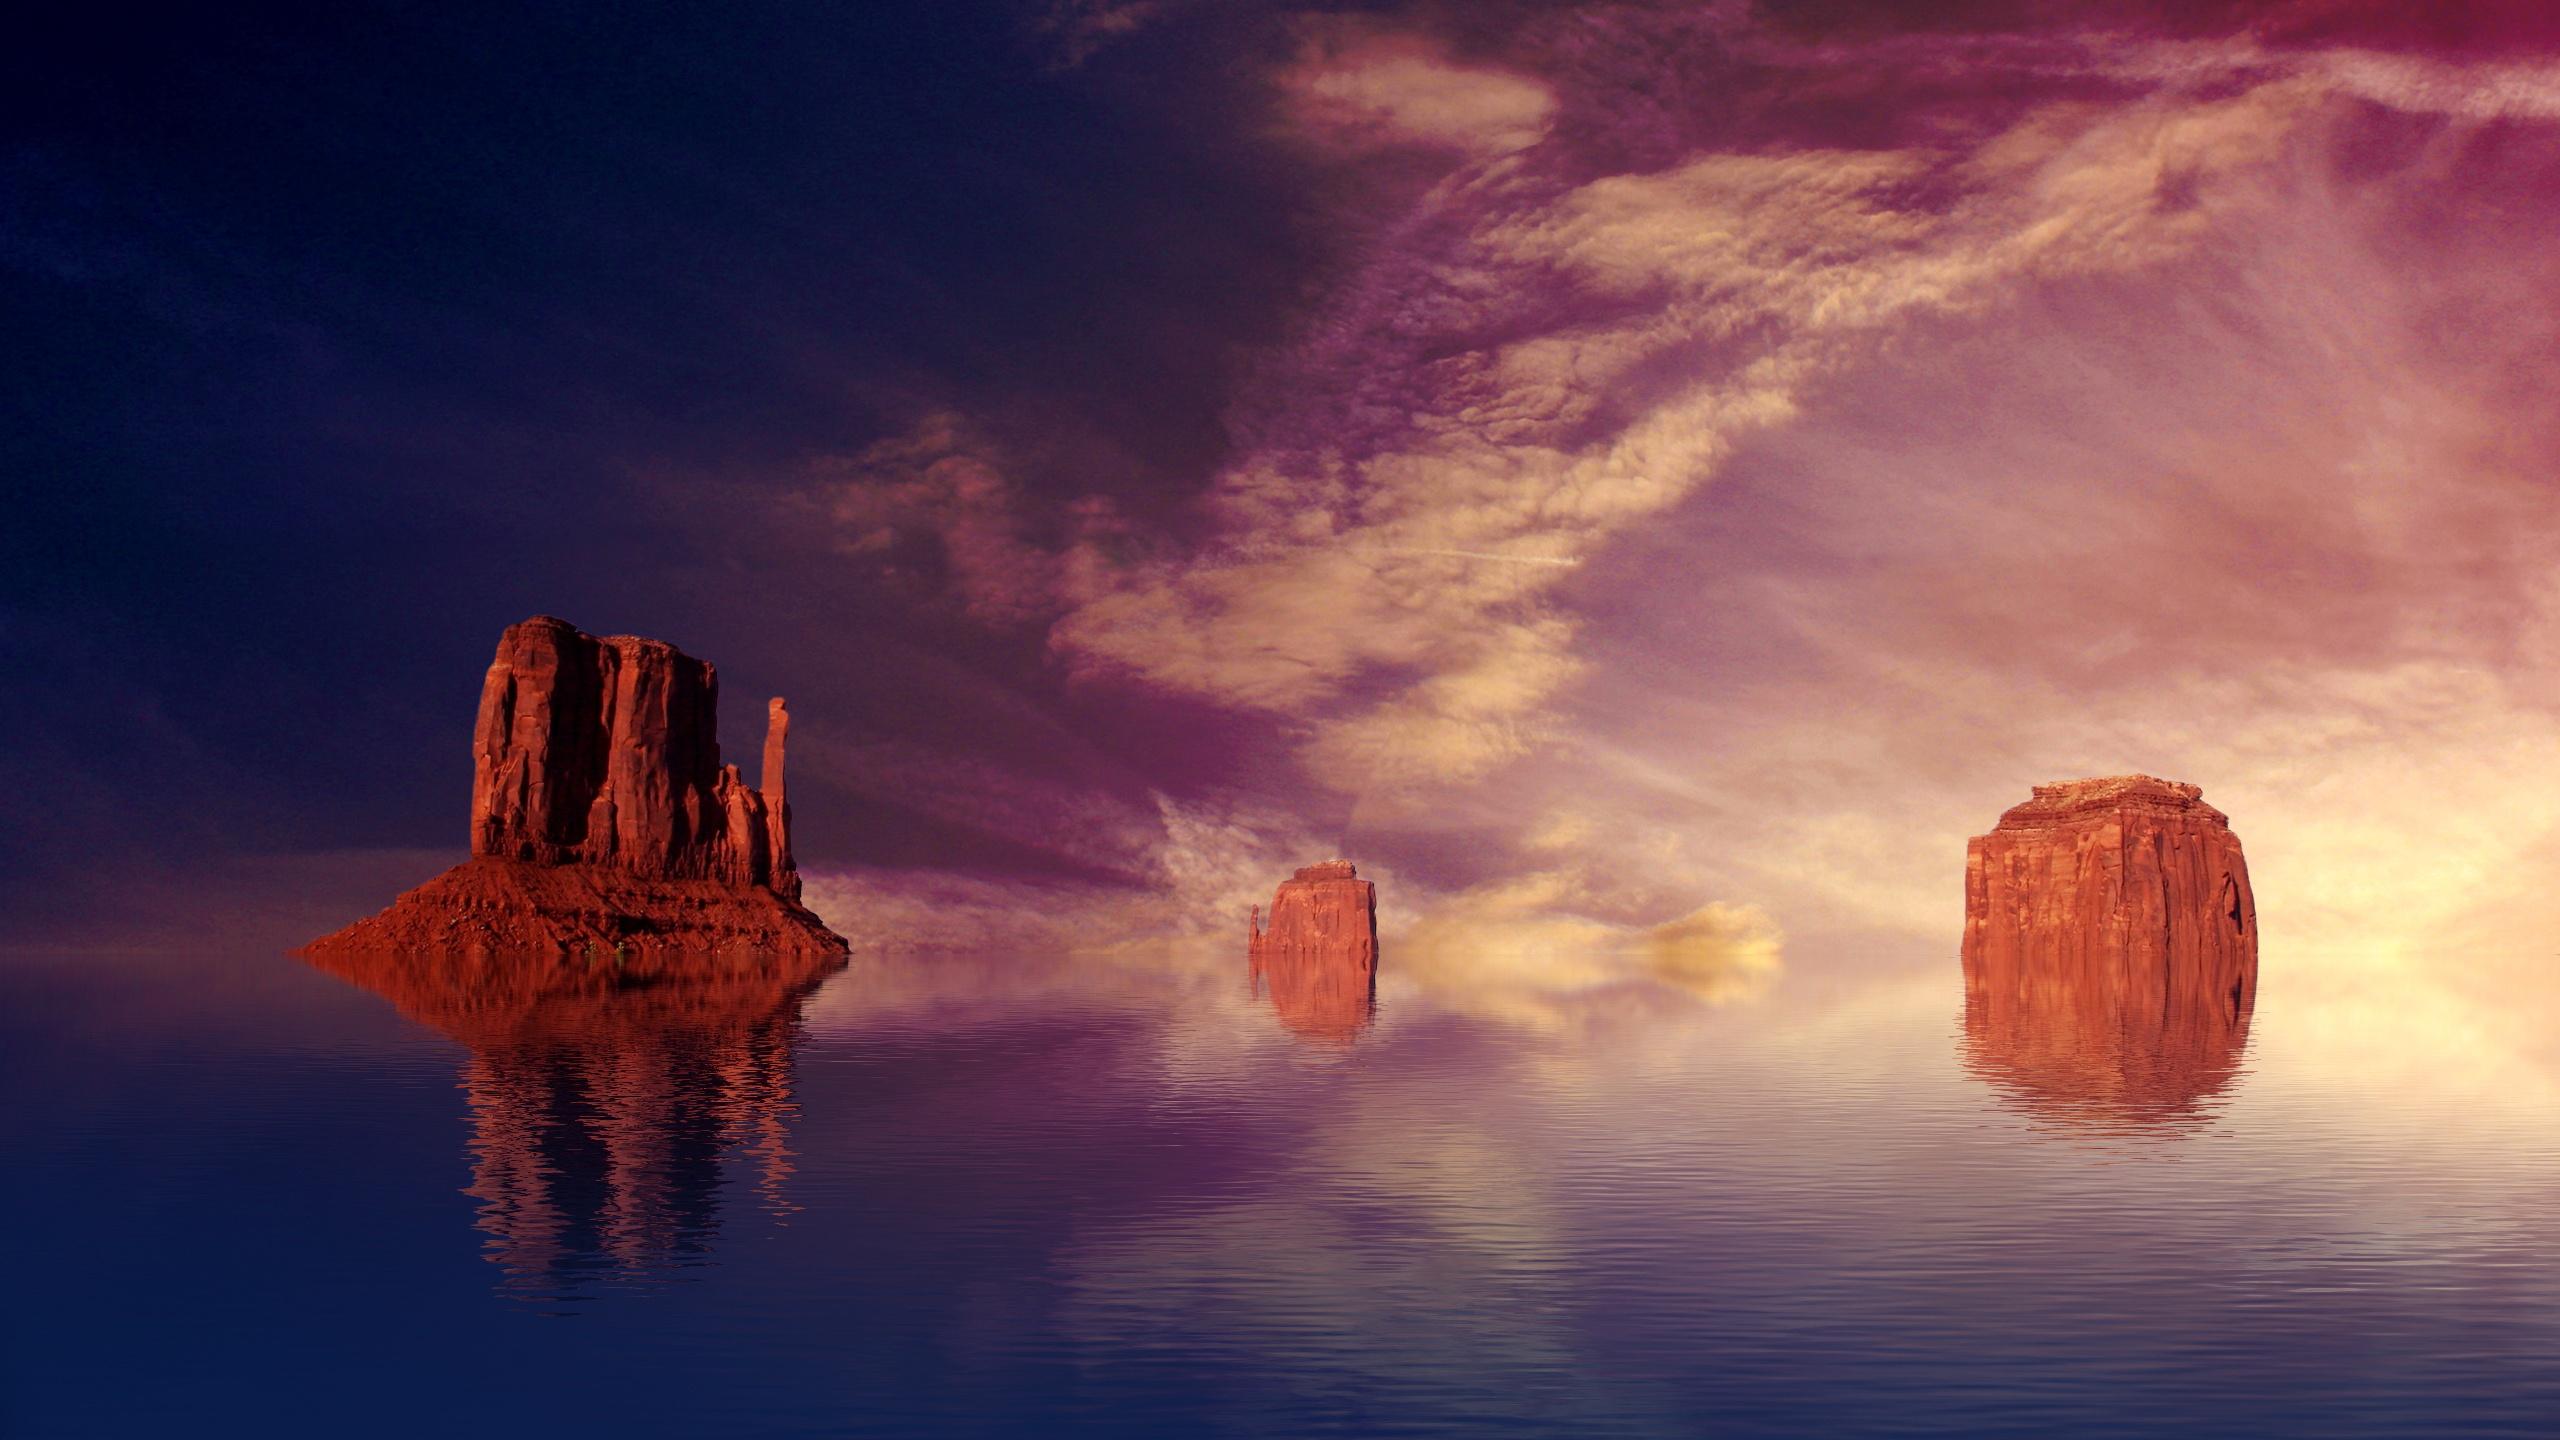 wallpaper 2560x1440 water mountains - photo #33